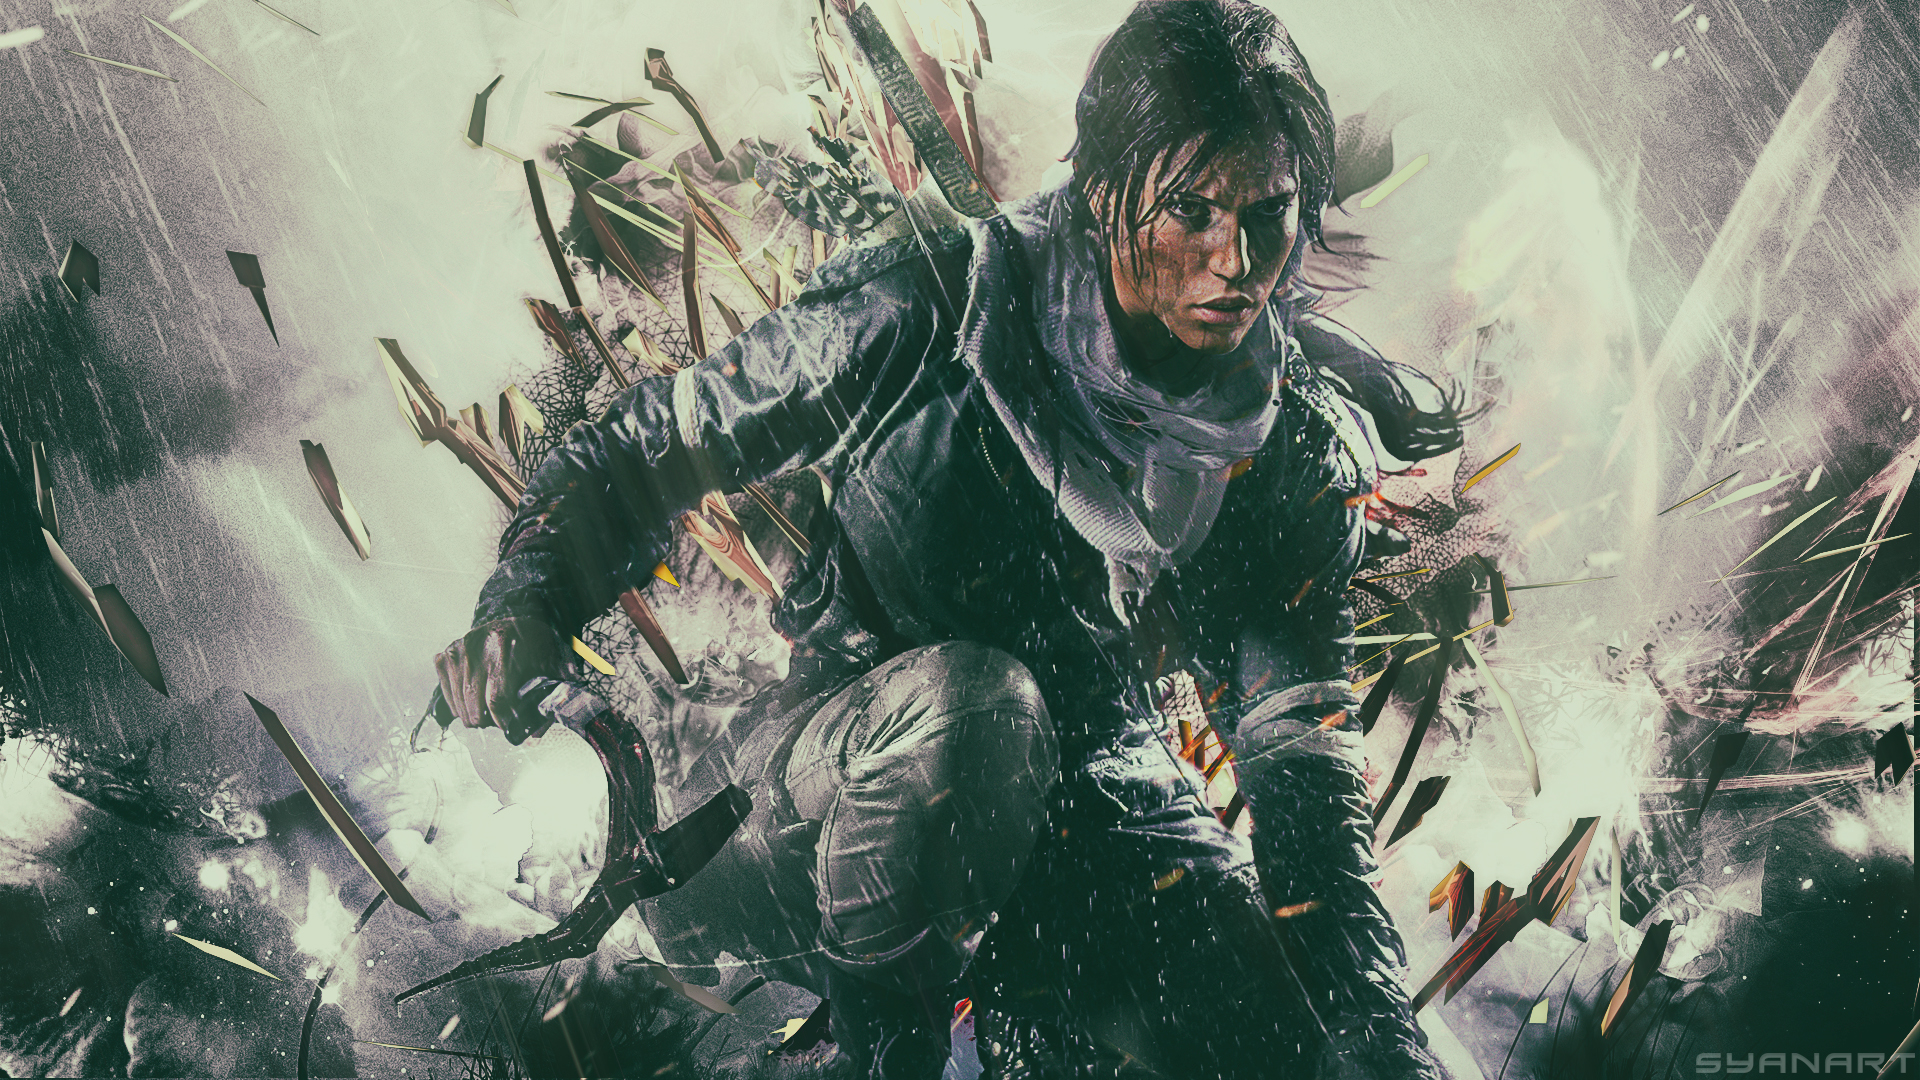 Free Download Rise Of The Tomb Raider Fullhd Wallpaper Syanart Station 1920x1080 For Your Desktop Mobile Tablet Explore 54 Tomb Raider 2015 Wallpaper Hd Lara Croft Tomb Raider Wallpaper